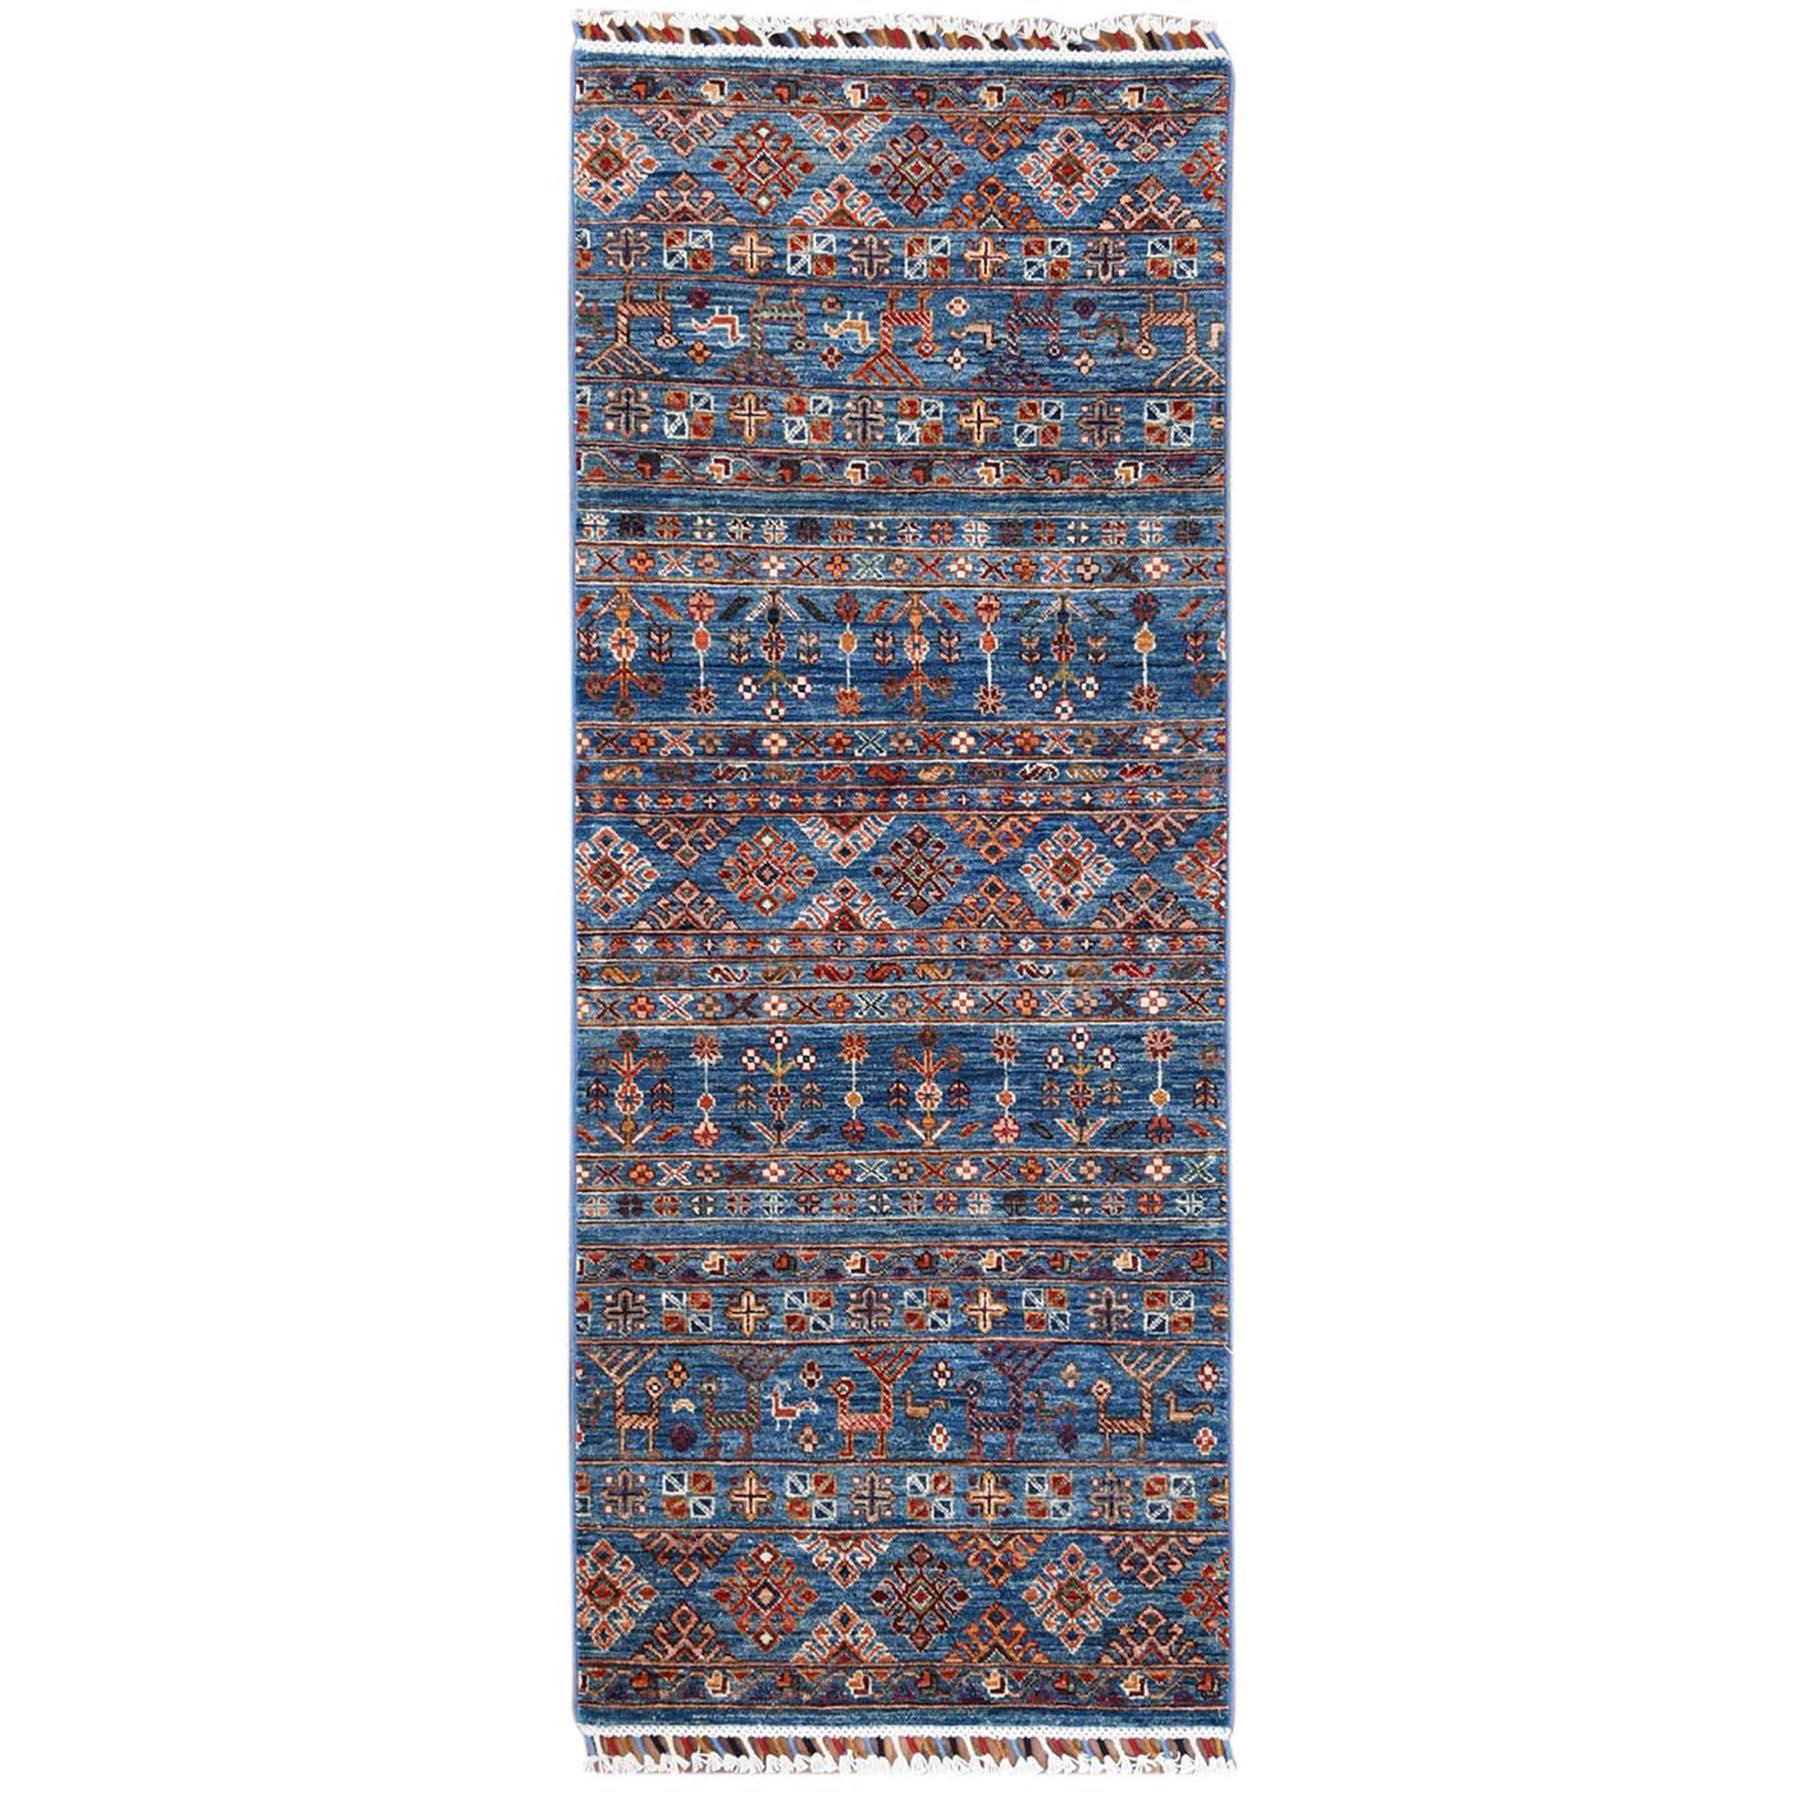 "2'6""X6'5"" Hand Knotted Denim Blue With Colorful Tassles Super Kazak Khorjin Design Pure Wool Oriental Runner Rug moa60bb0"